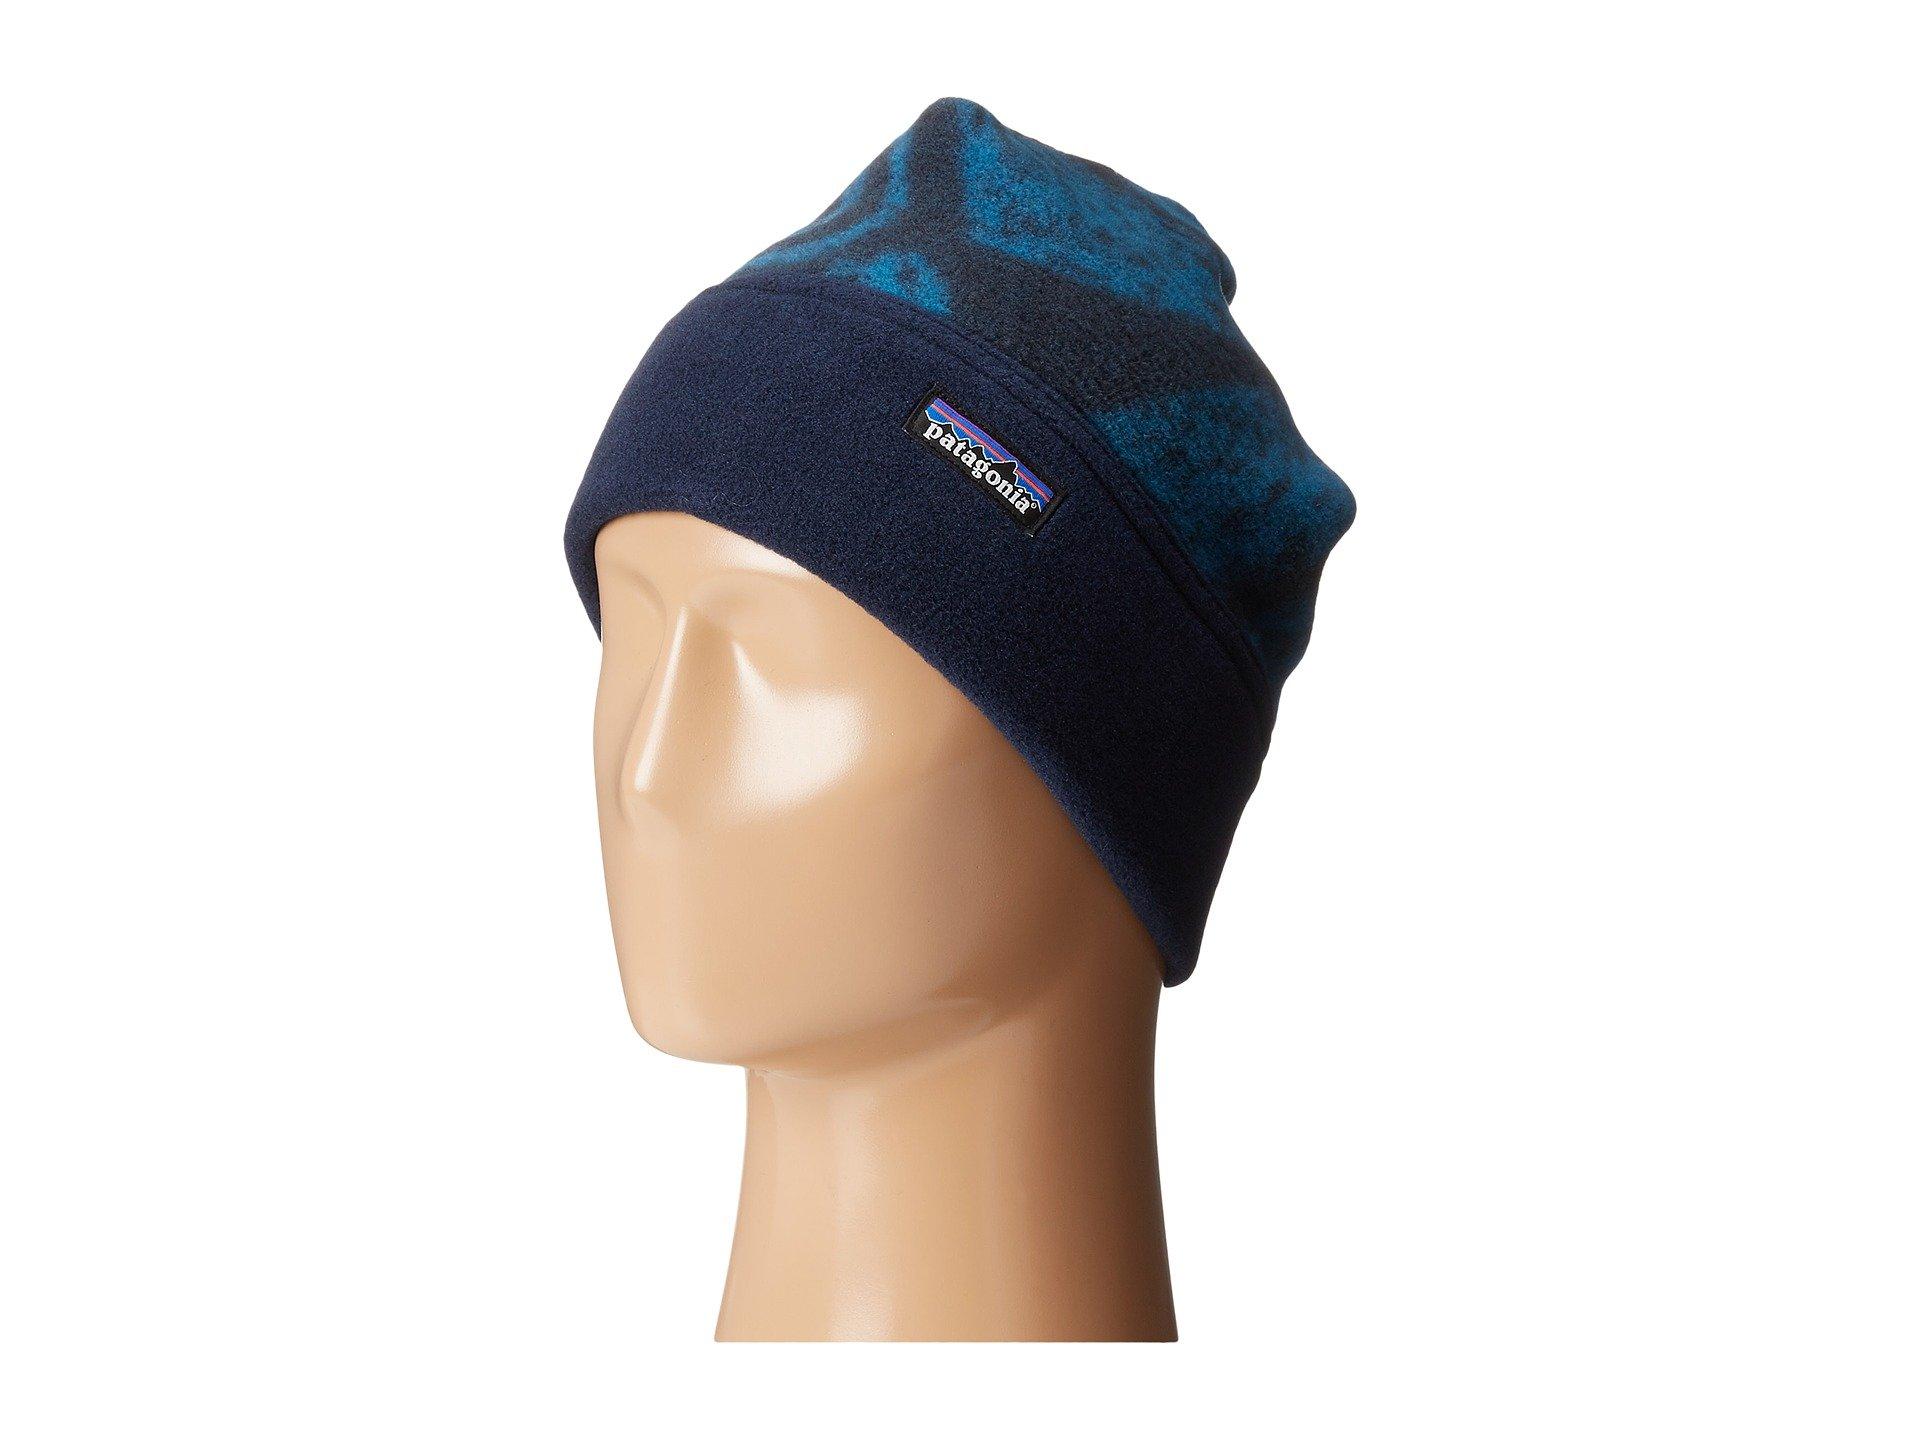 Patagonia Synch Alpine Hat In Shale Navy Blue  b9b1e5b9968